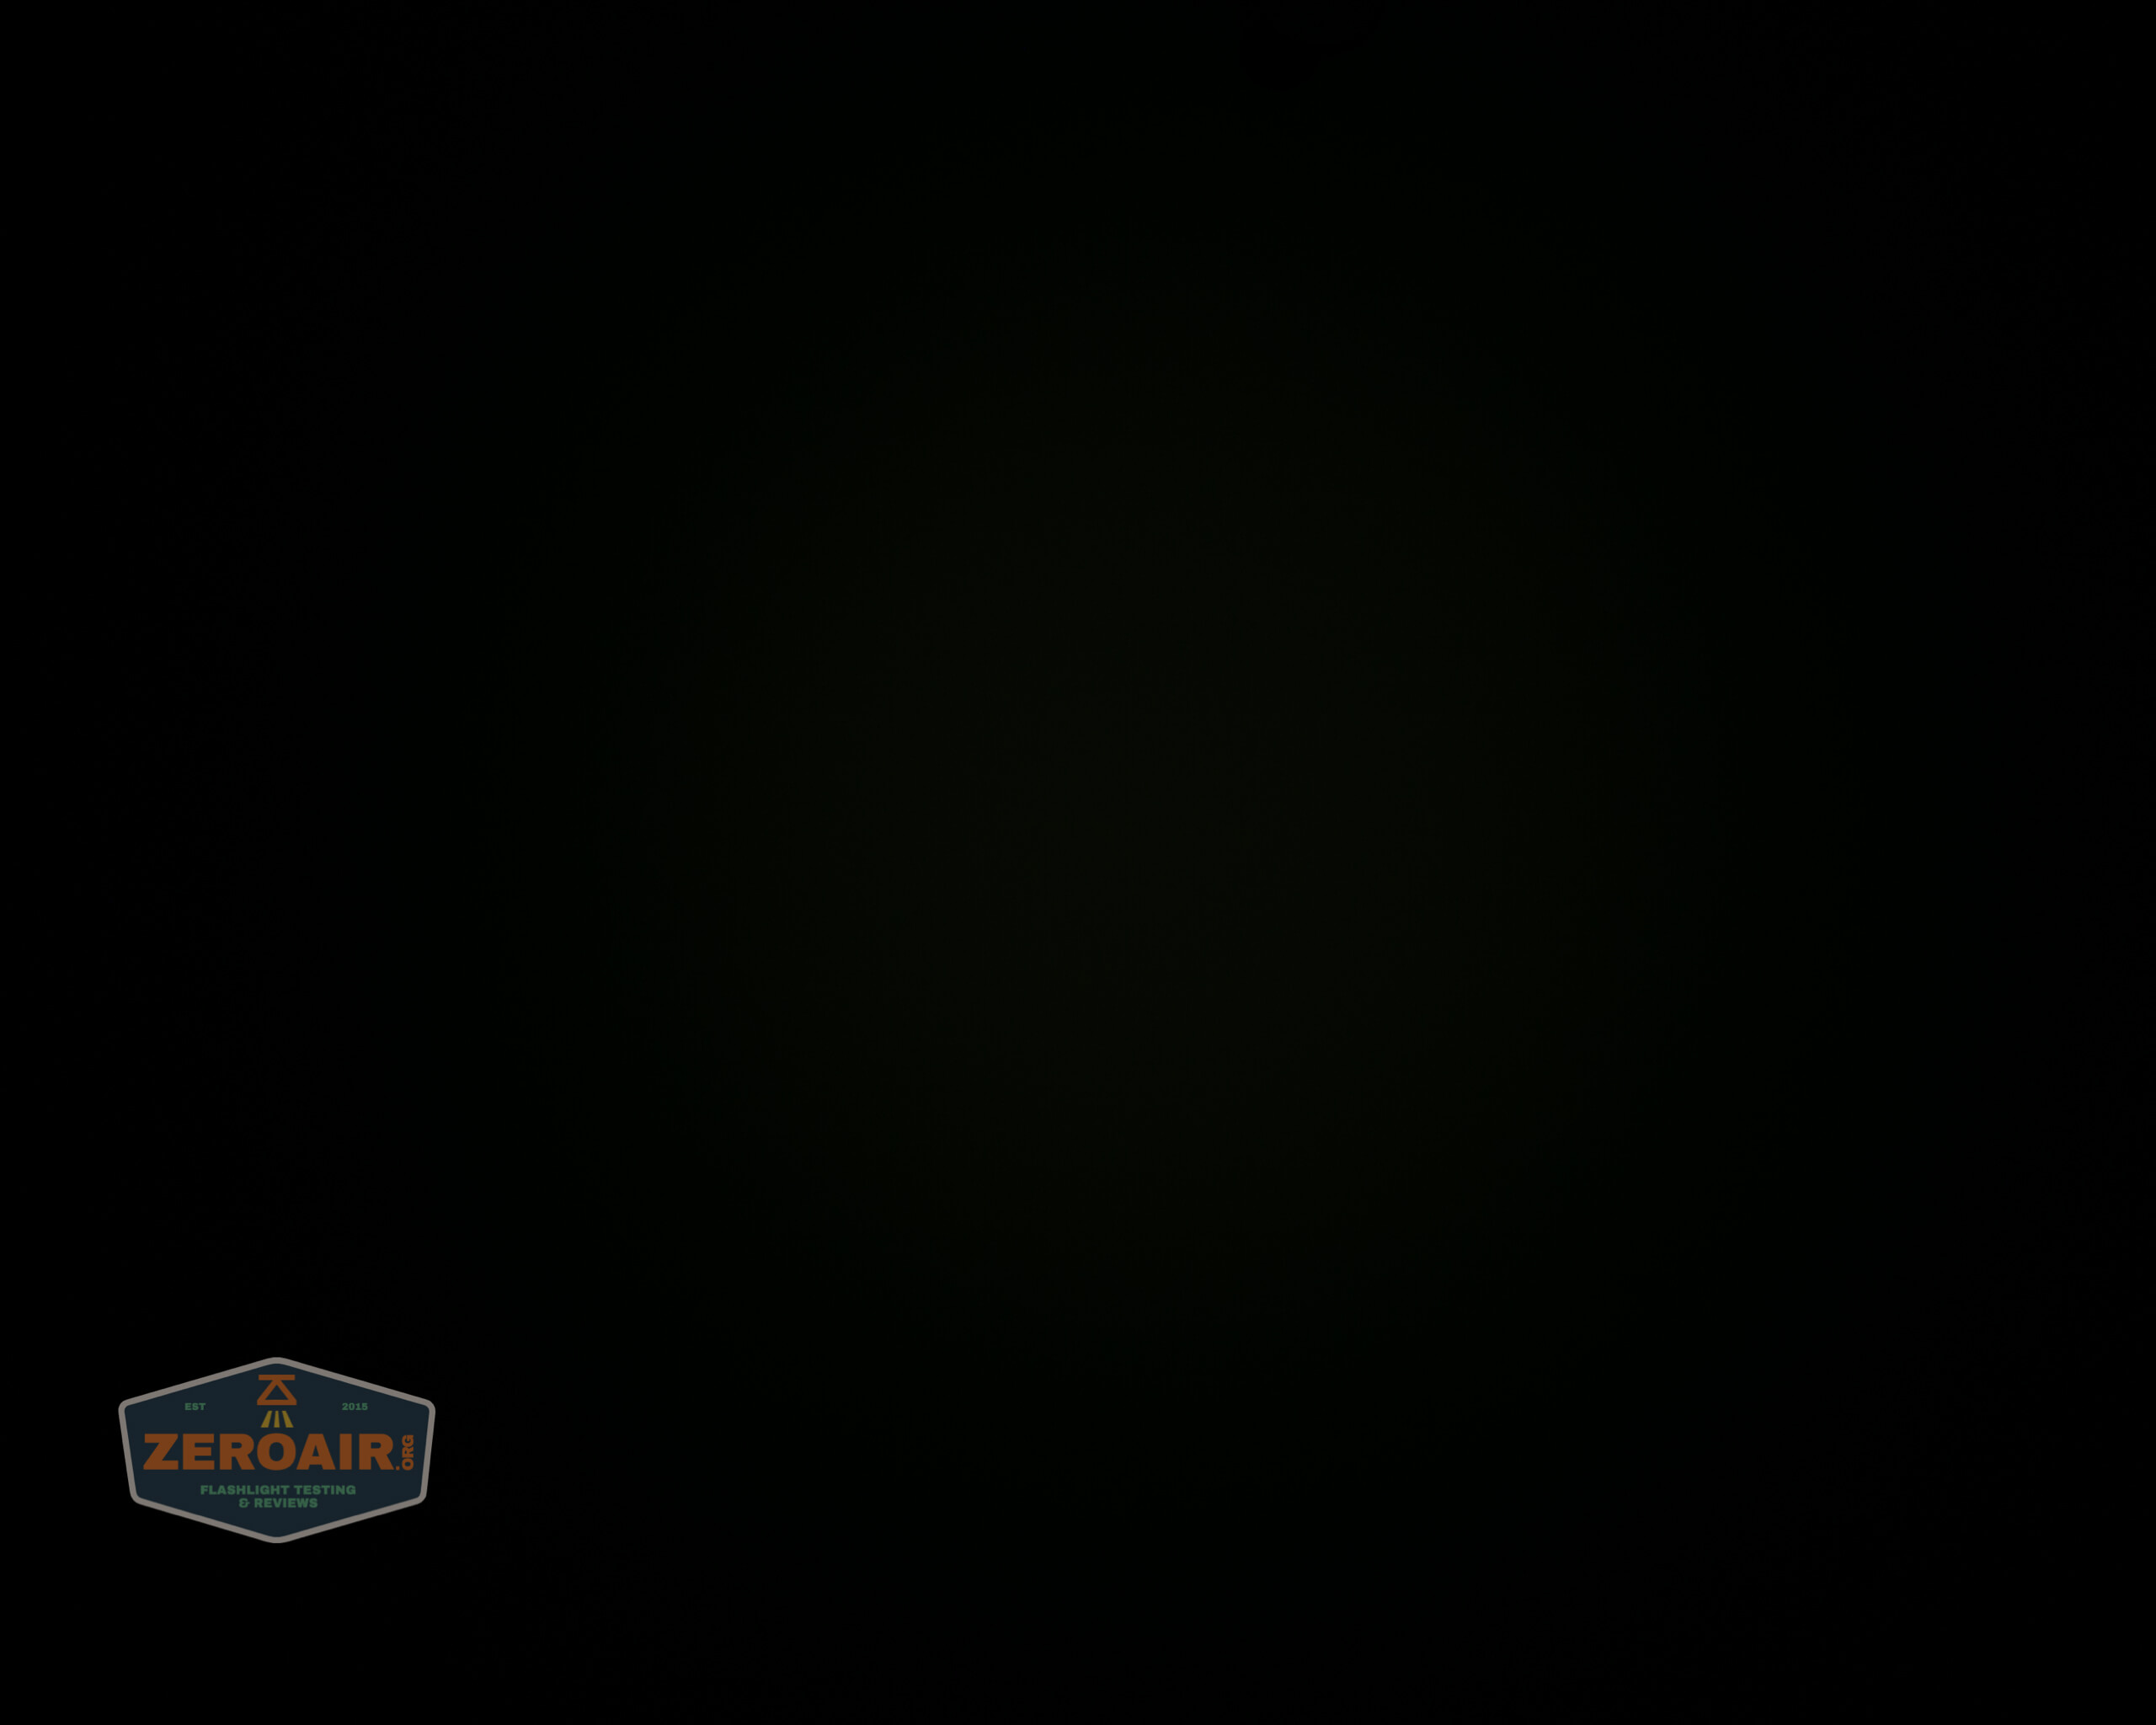 manker e14iii 18650 flood flashlight beamshot ceiling 3